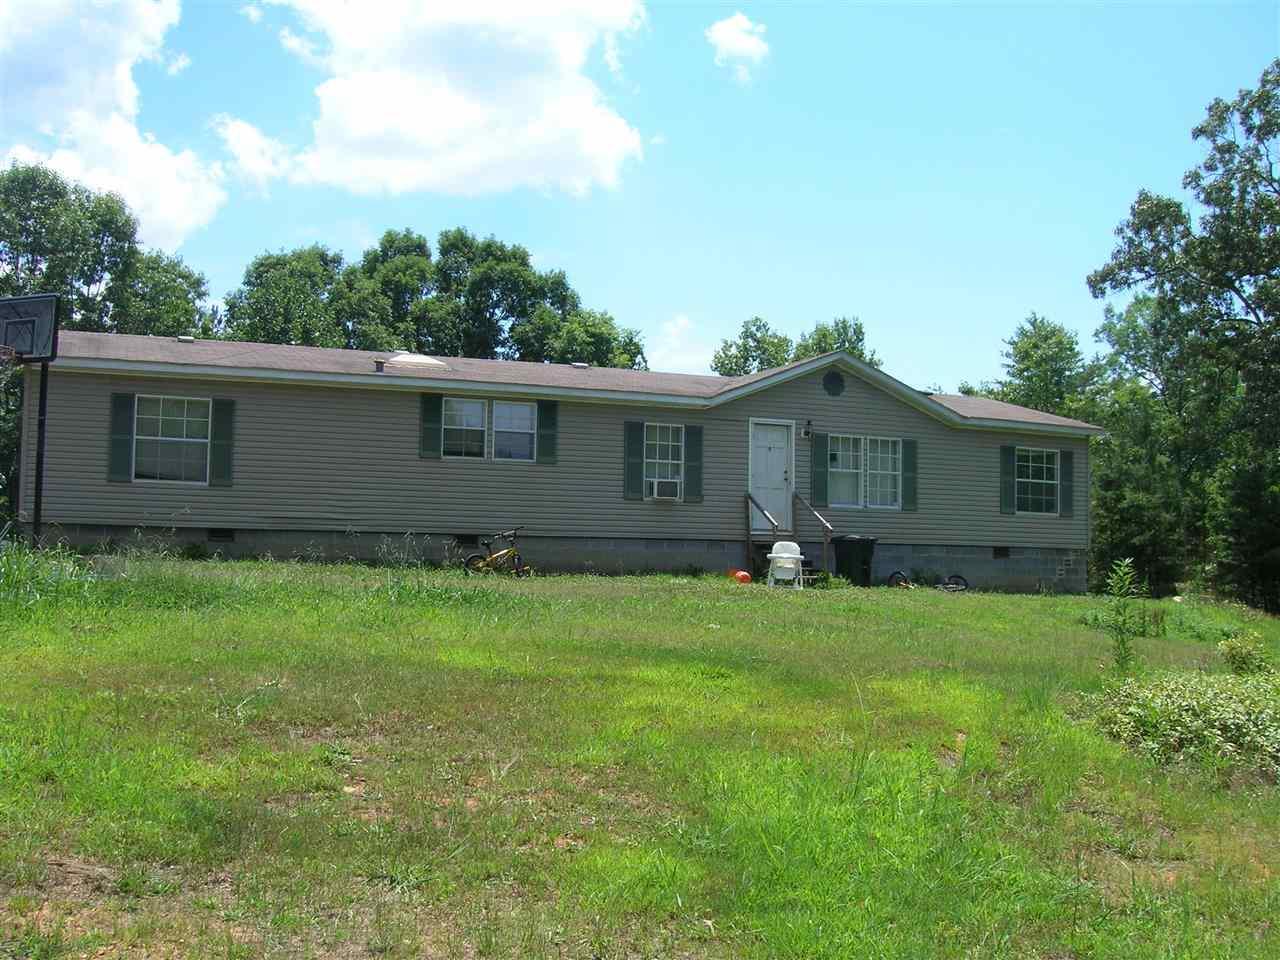 518 Corbin Dairy Rd, Bostic, NC 28018